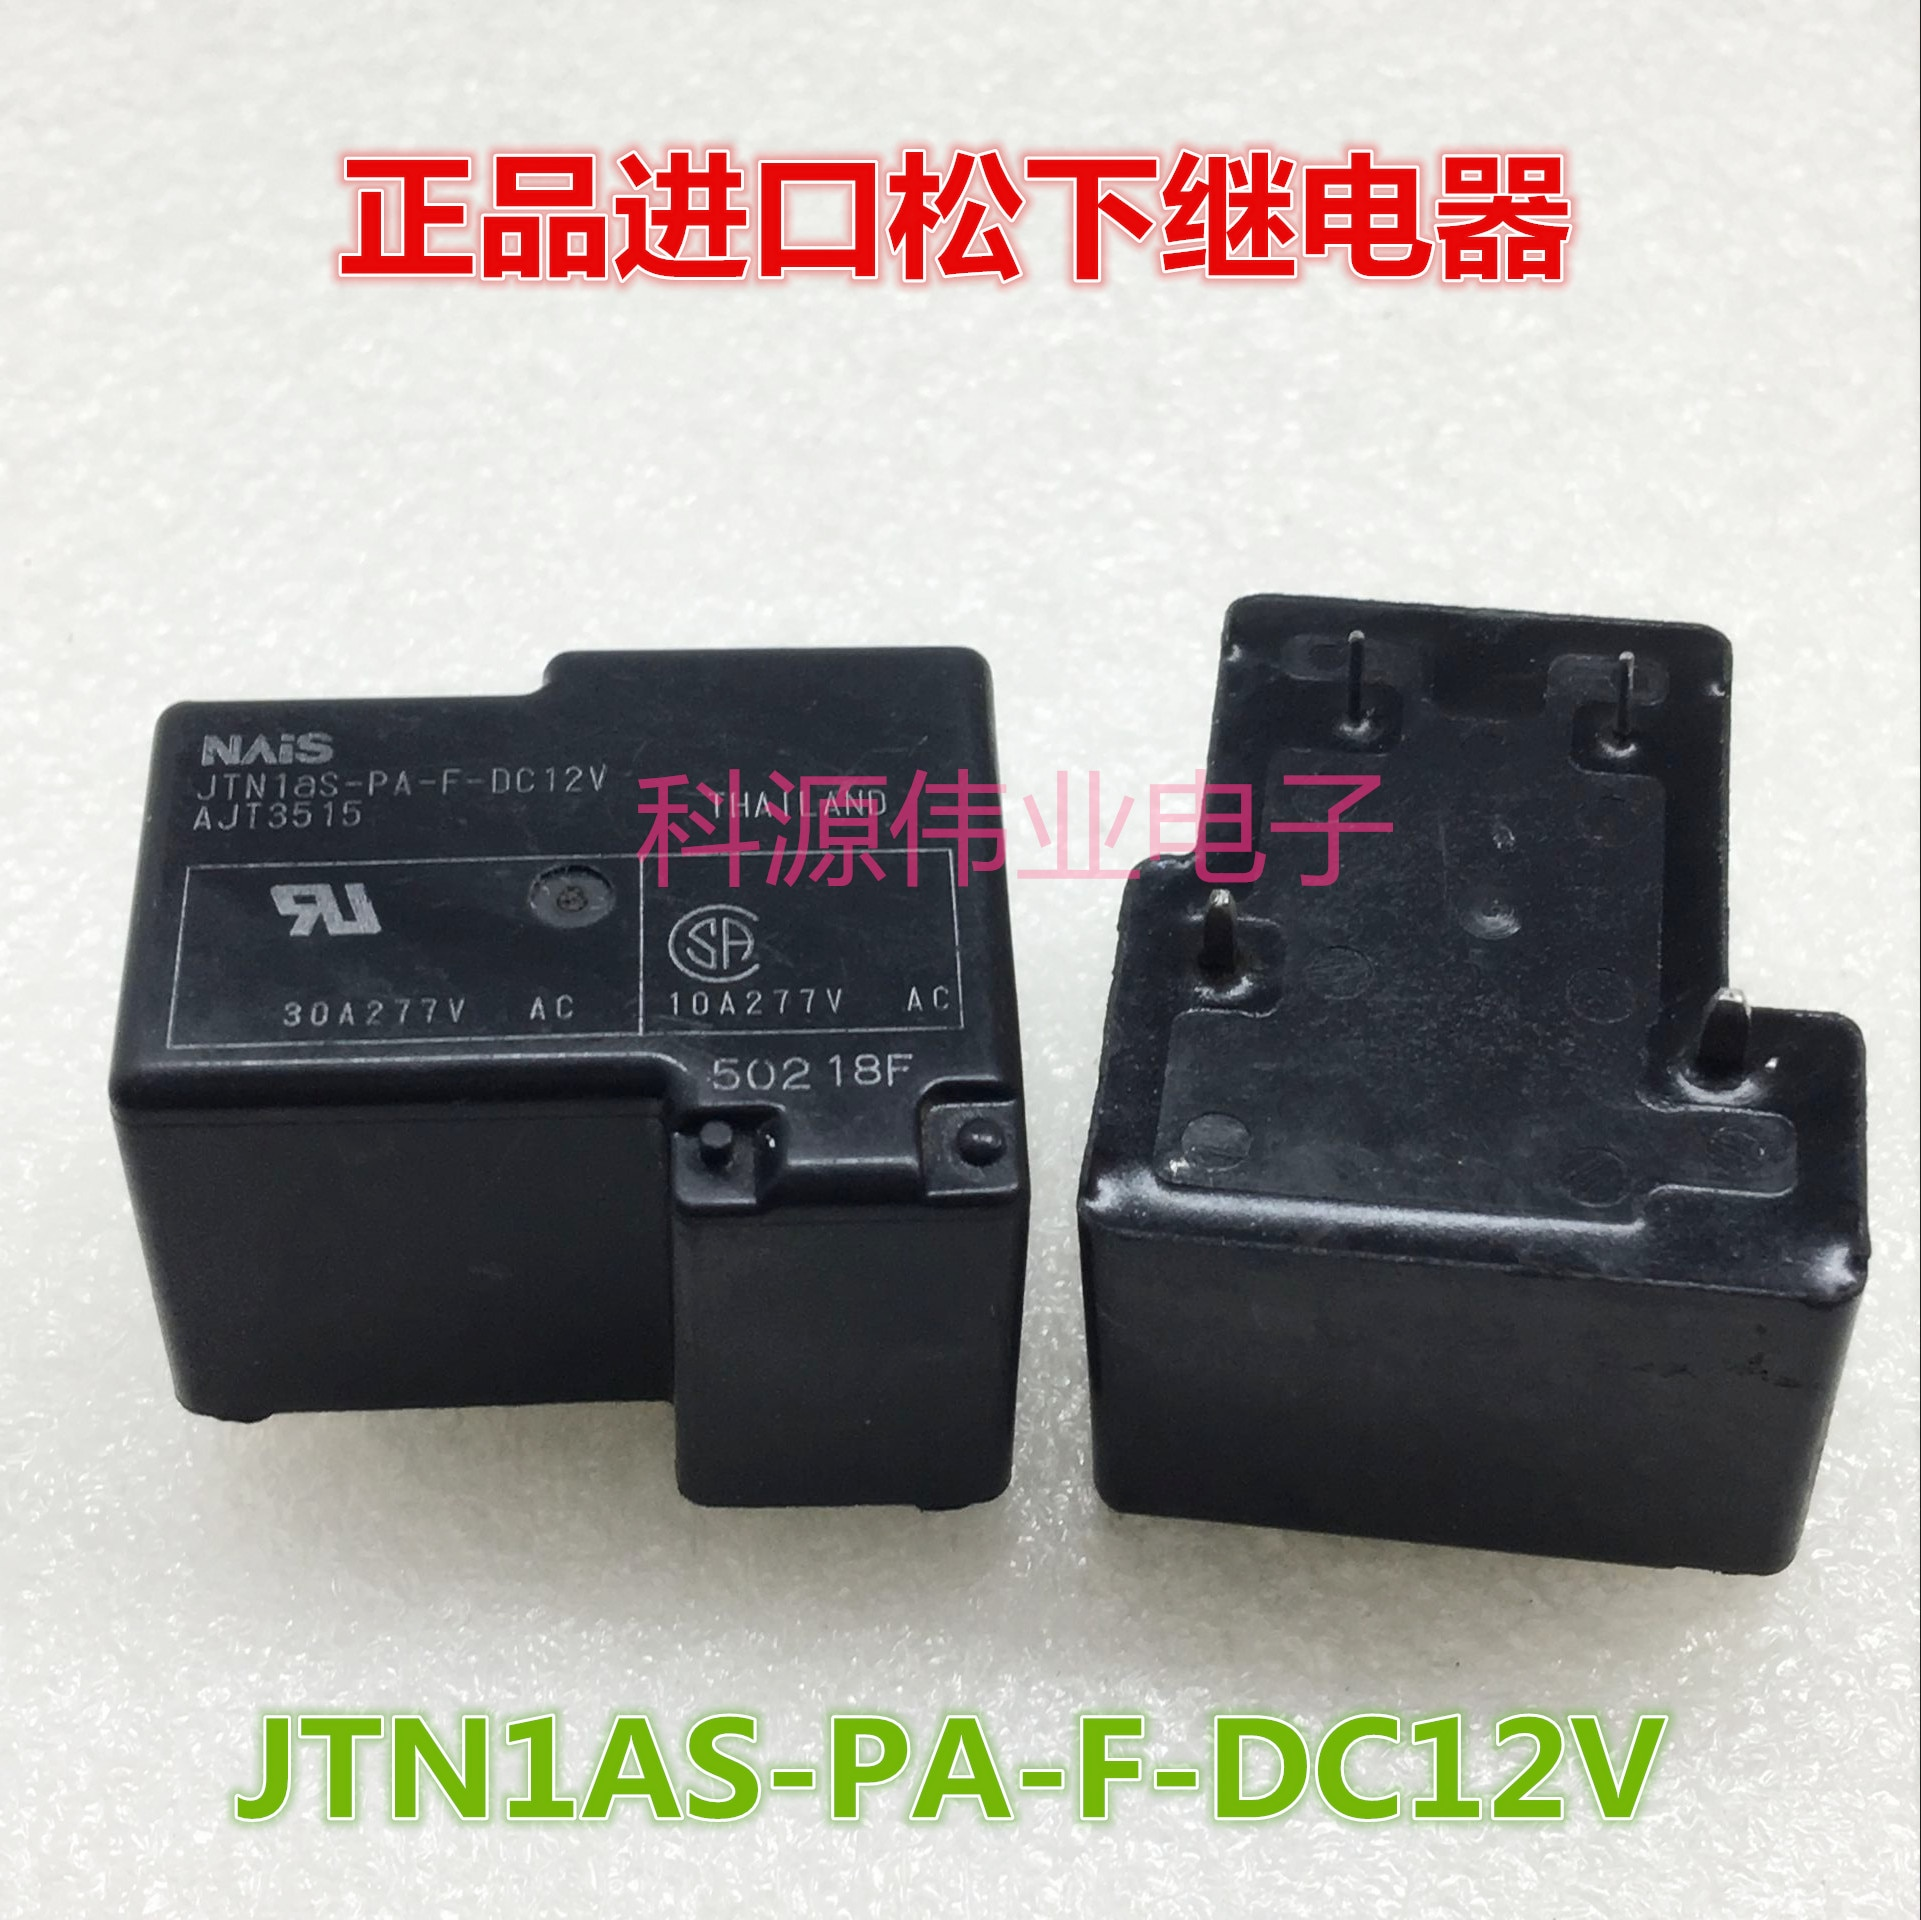 Relé de JTN1AS-PA-F-DC12V AJT3515 12VDC 30APIN